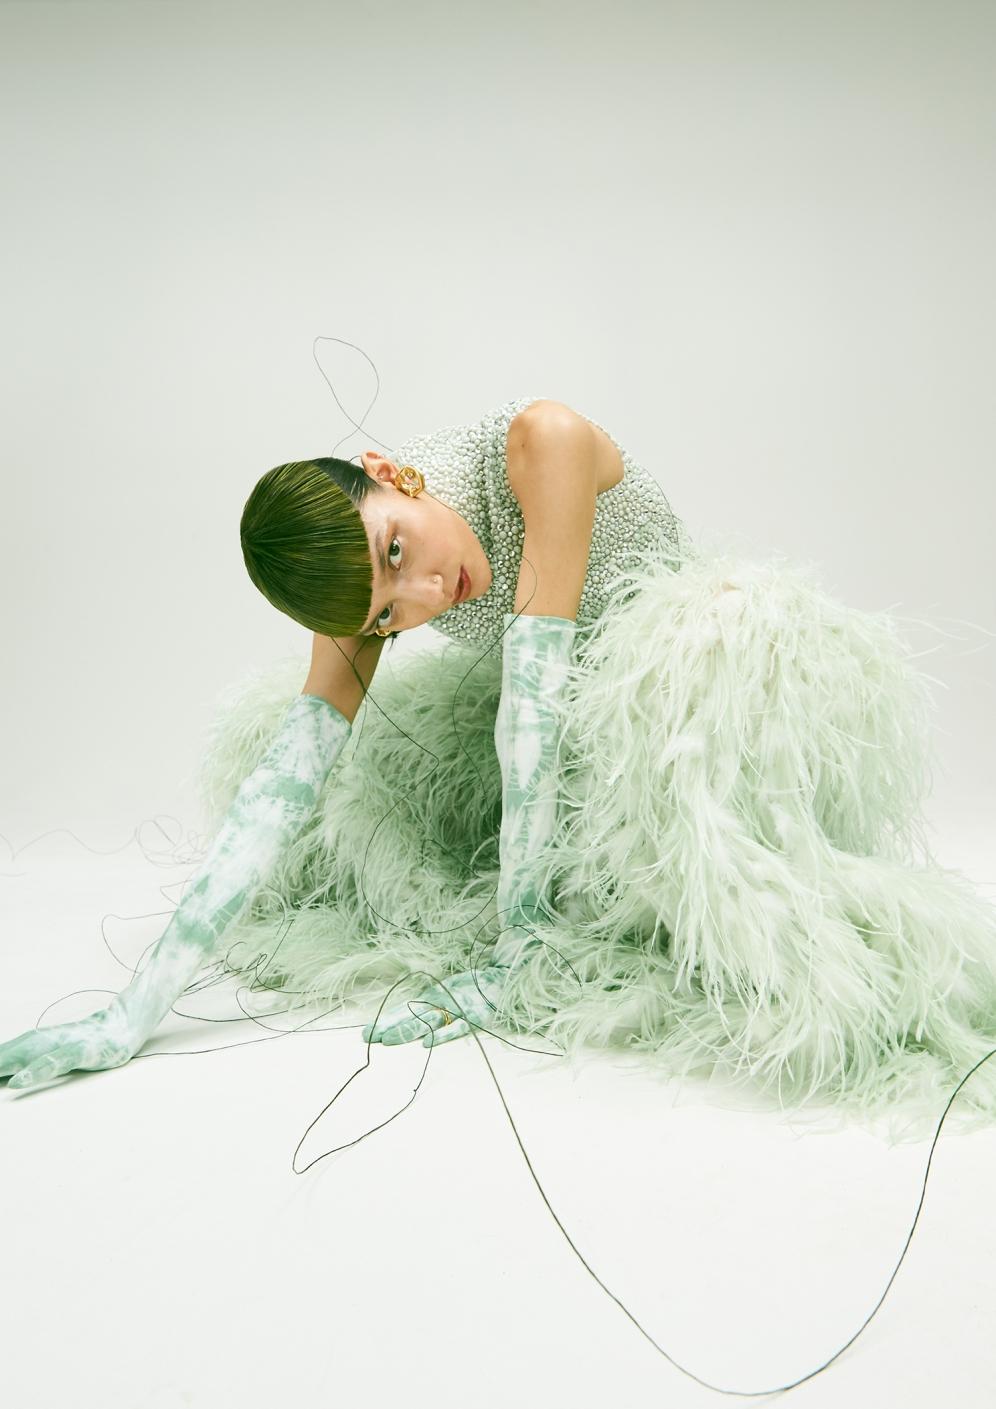 Midori | NR Magazine